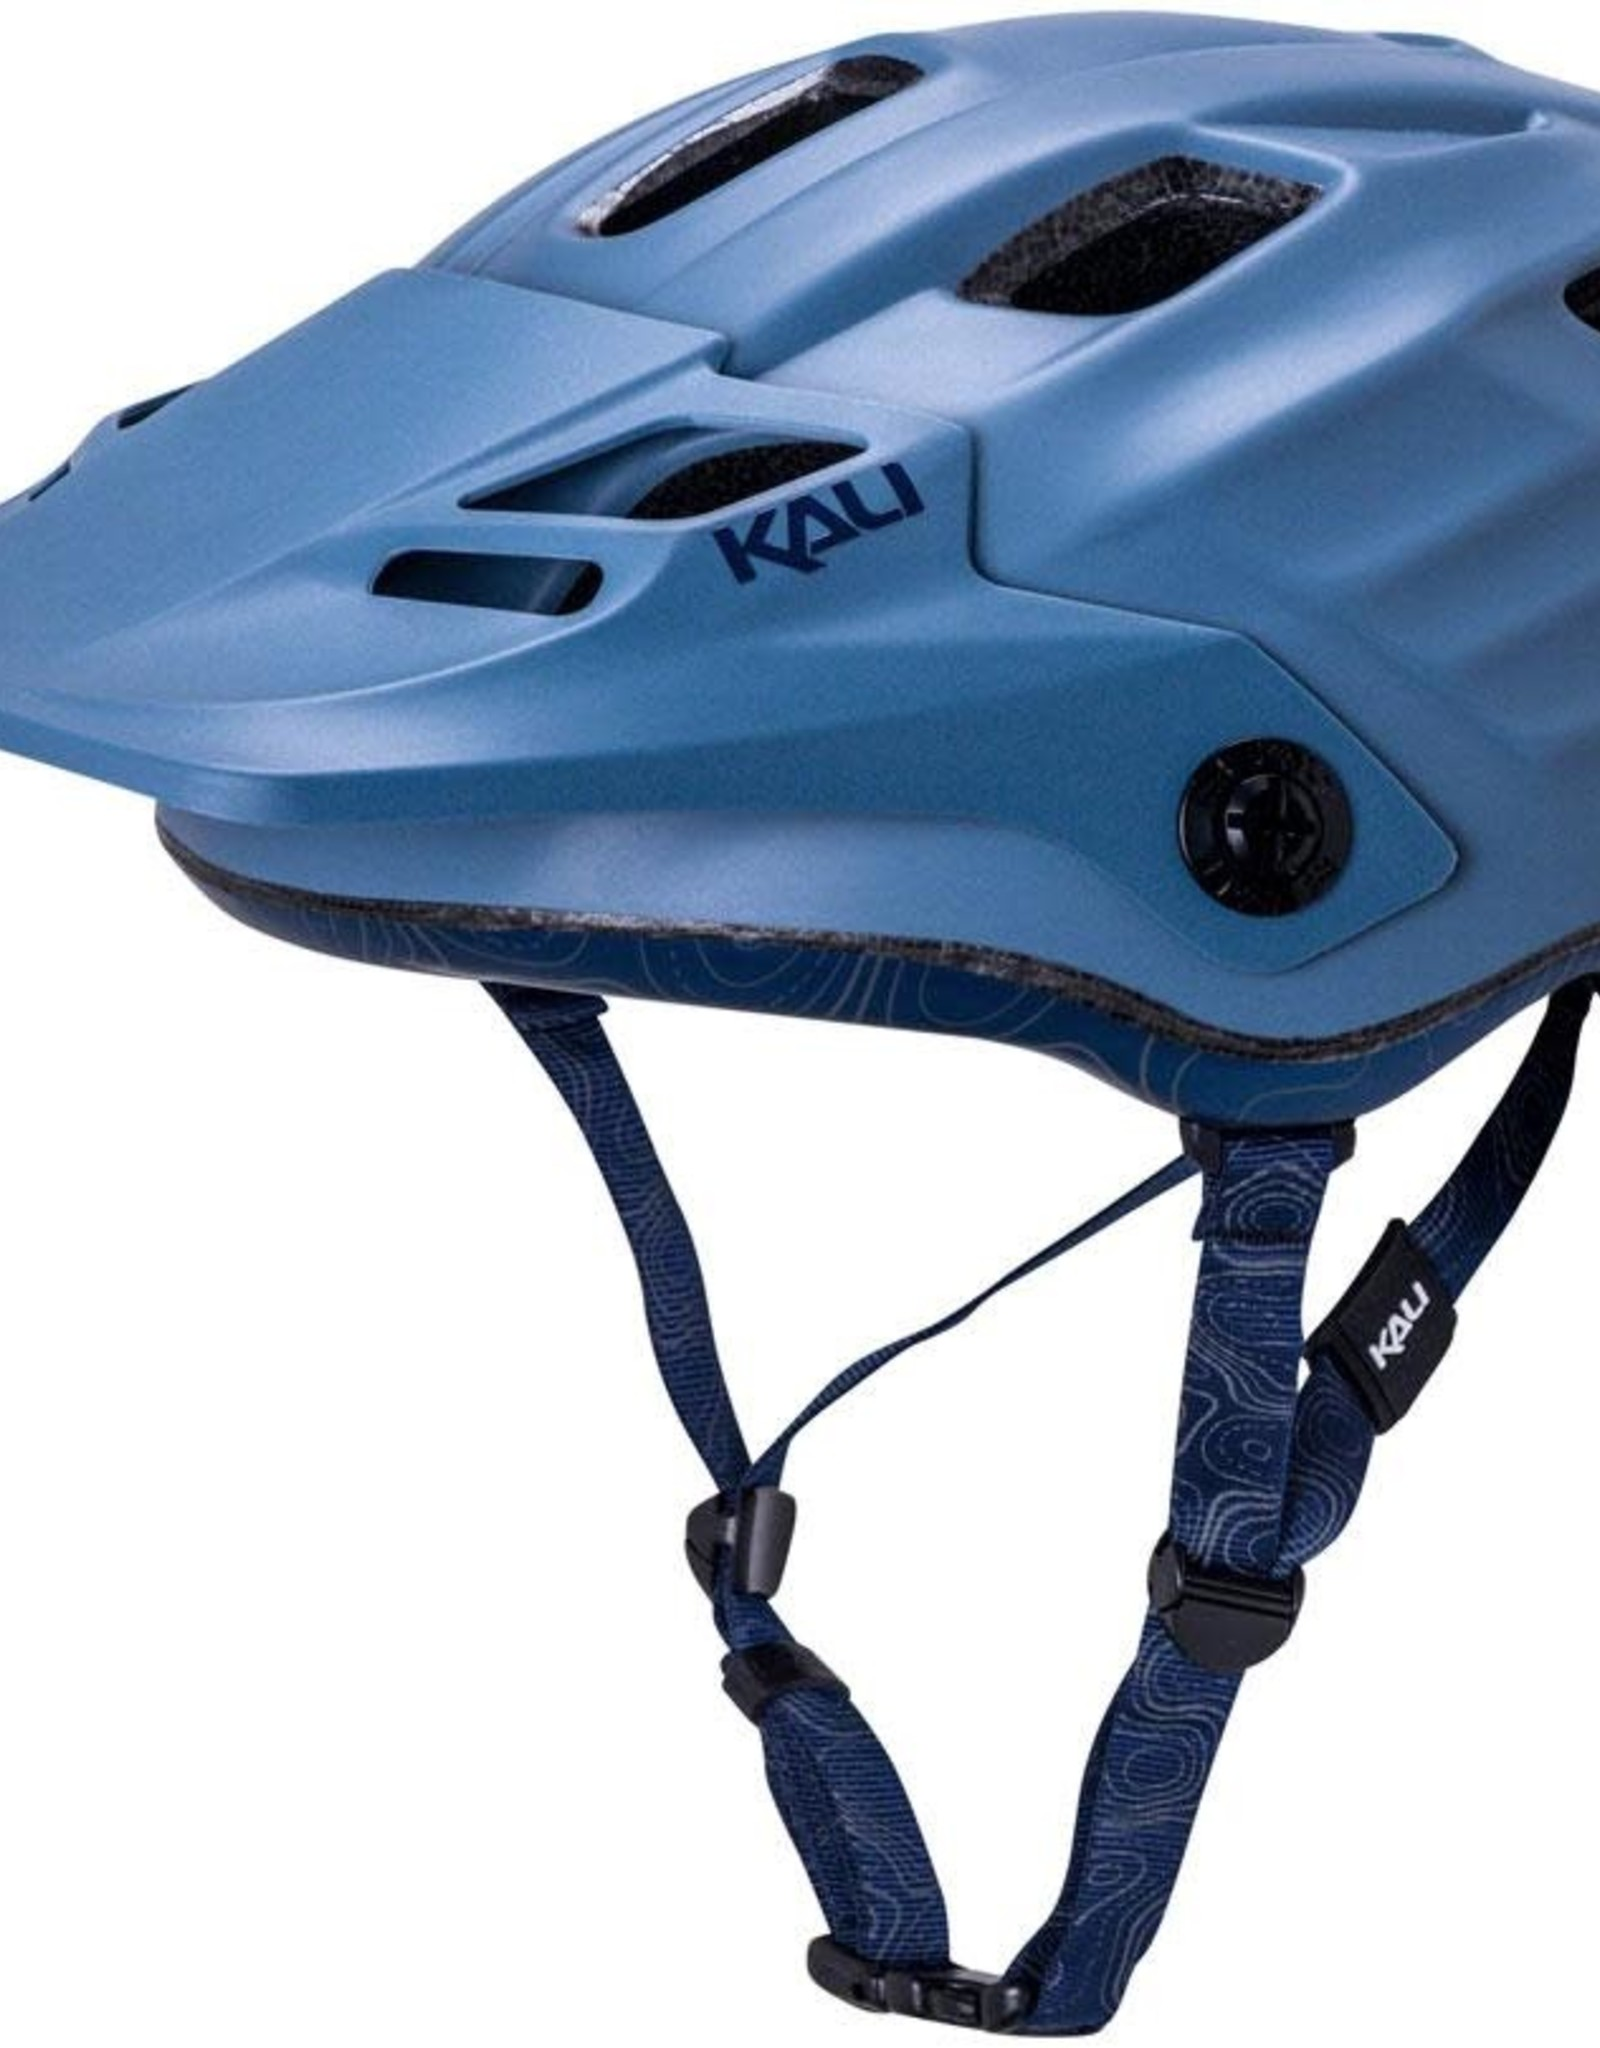 Kali Protectives Kali Maya 3.0 Solid Matte THD/NVY S/M